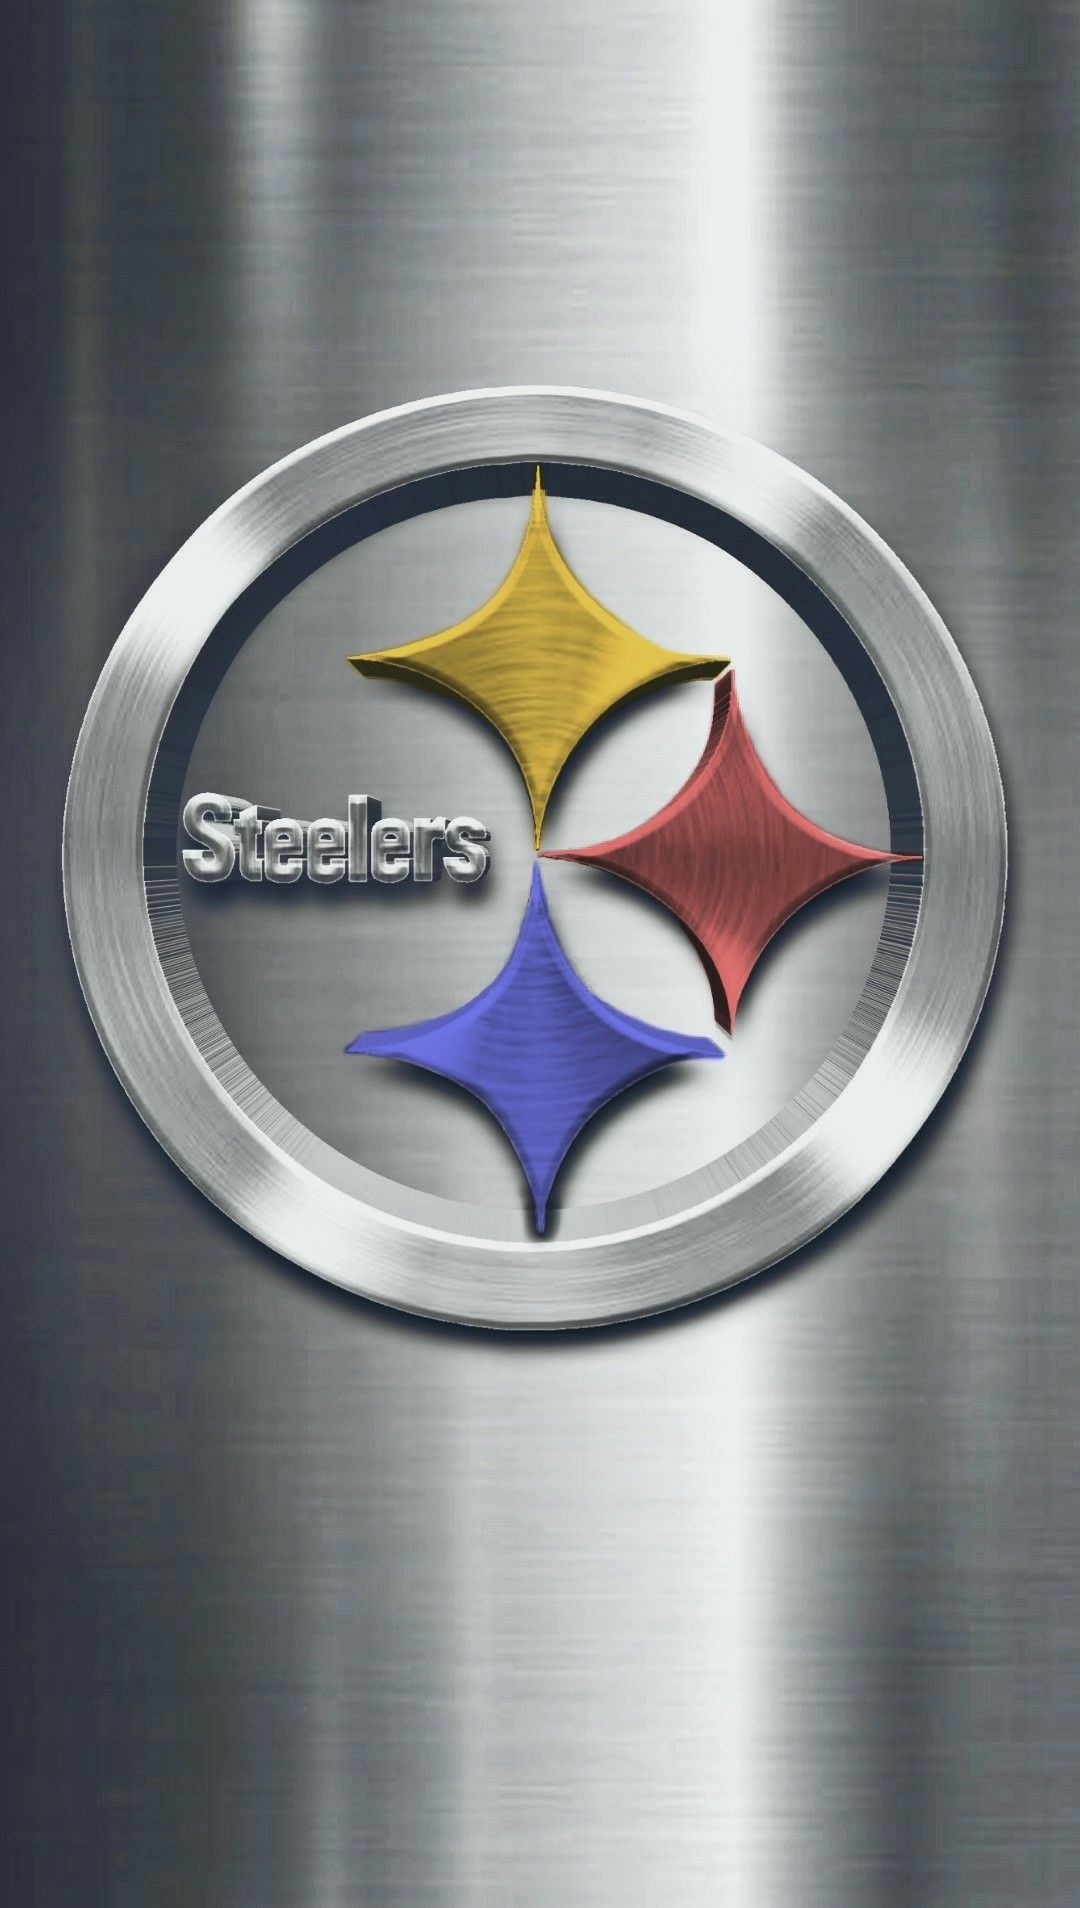 Steelers Wallpaper Pittsburgh Steelers Jerseys Pittsburgh Steelers Wallpaper Pittsburg Steelers